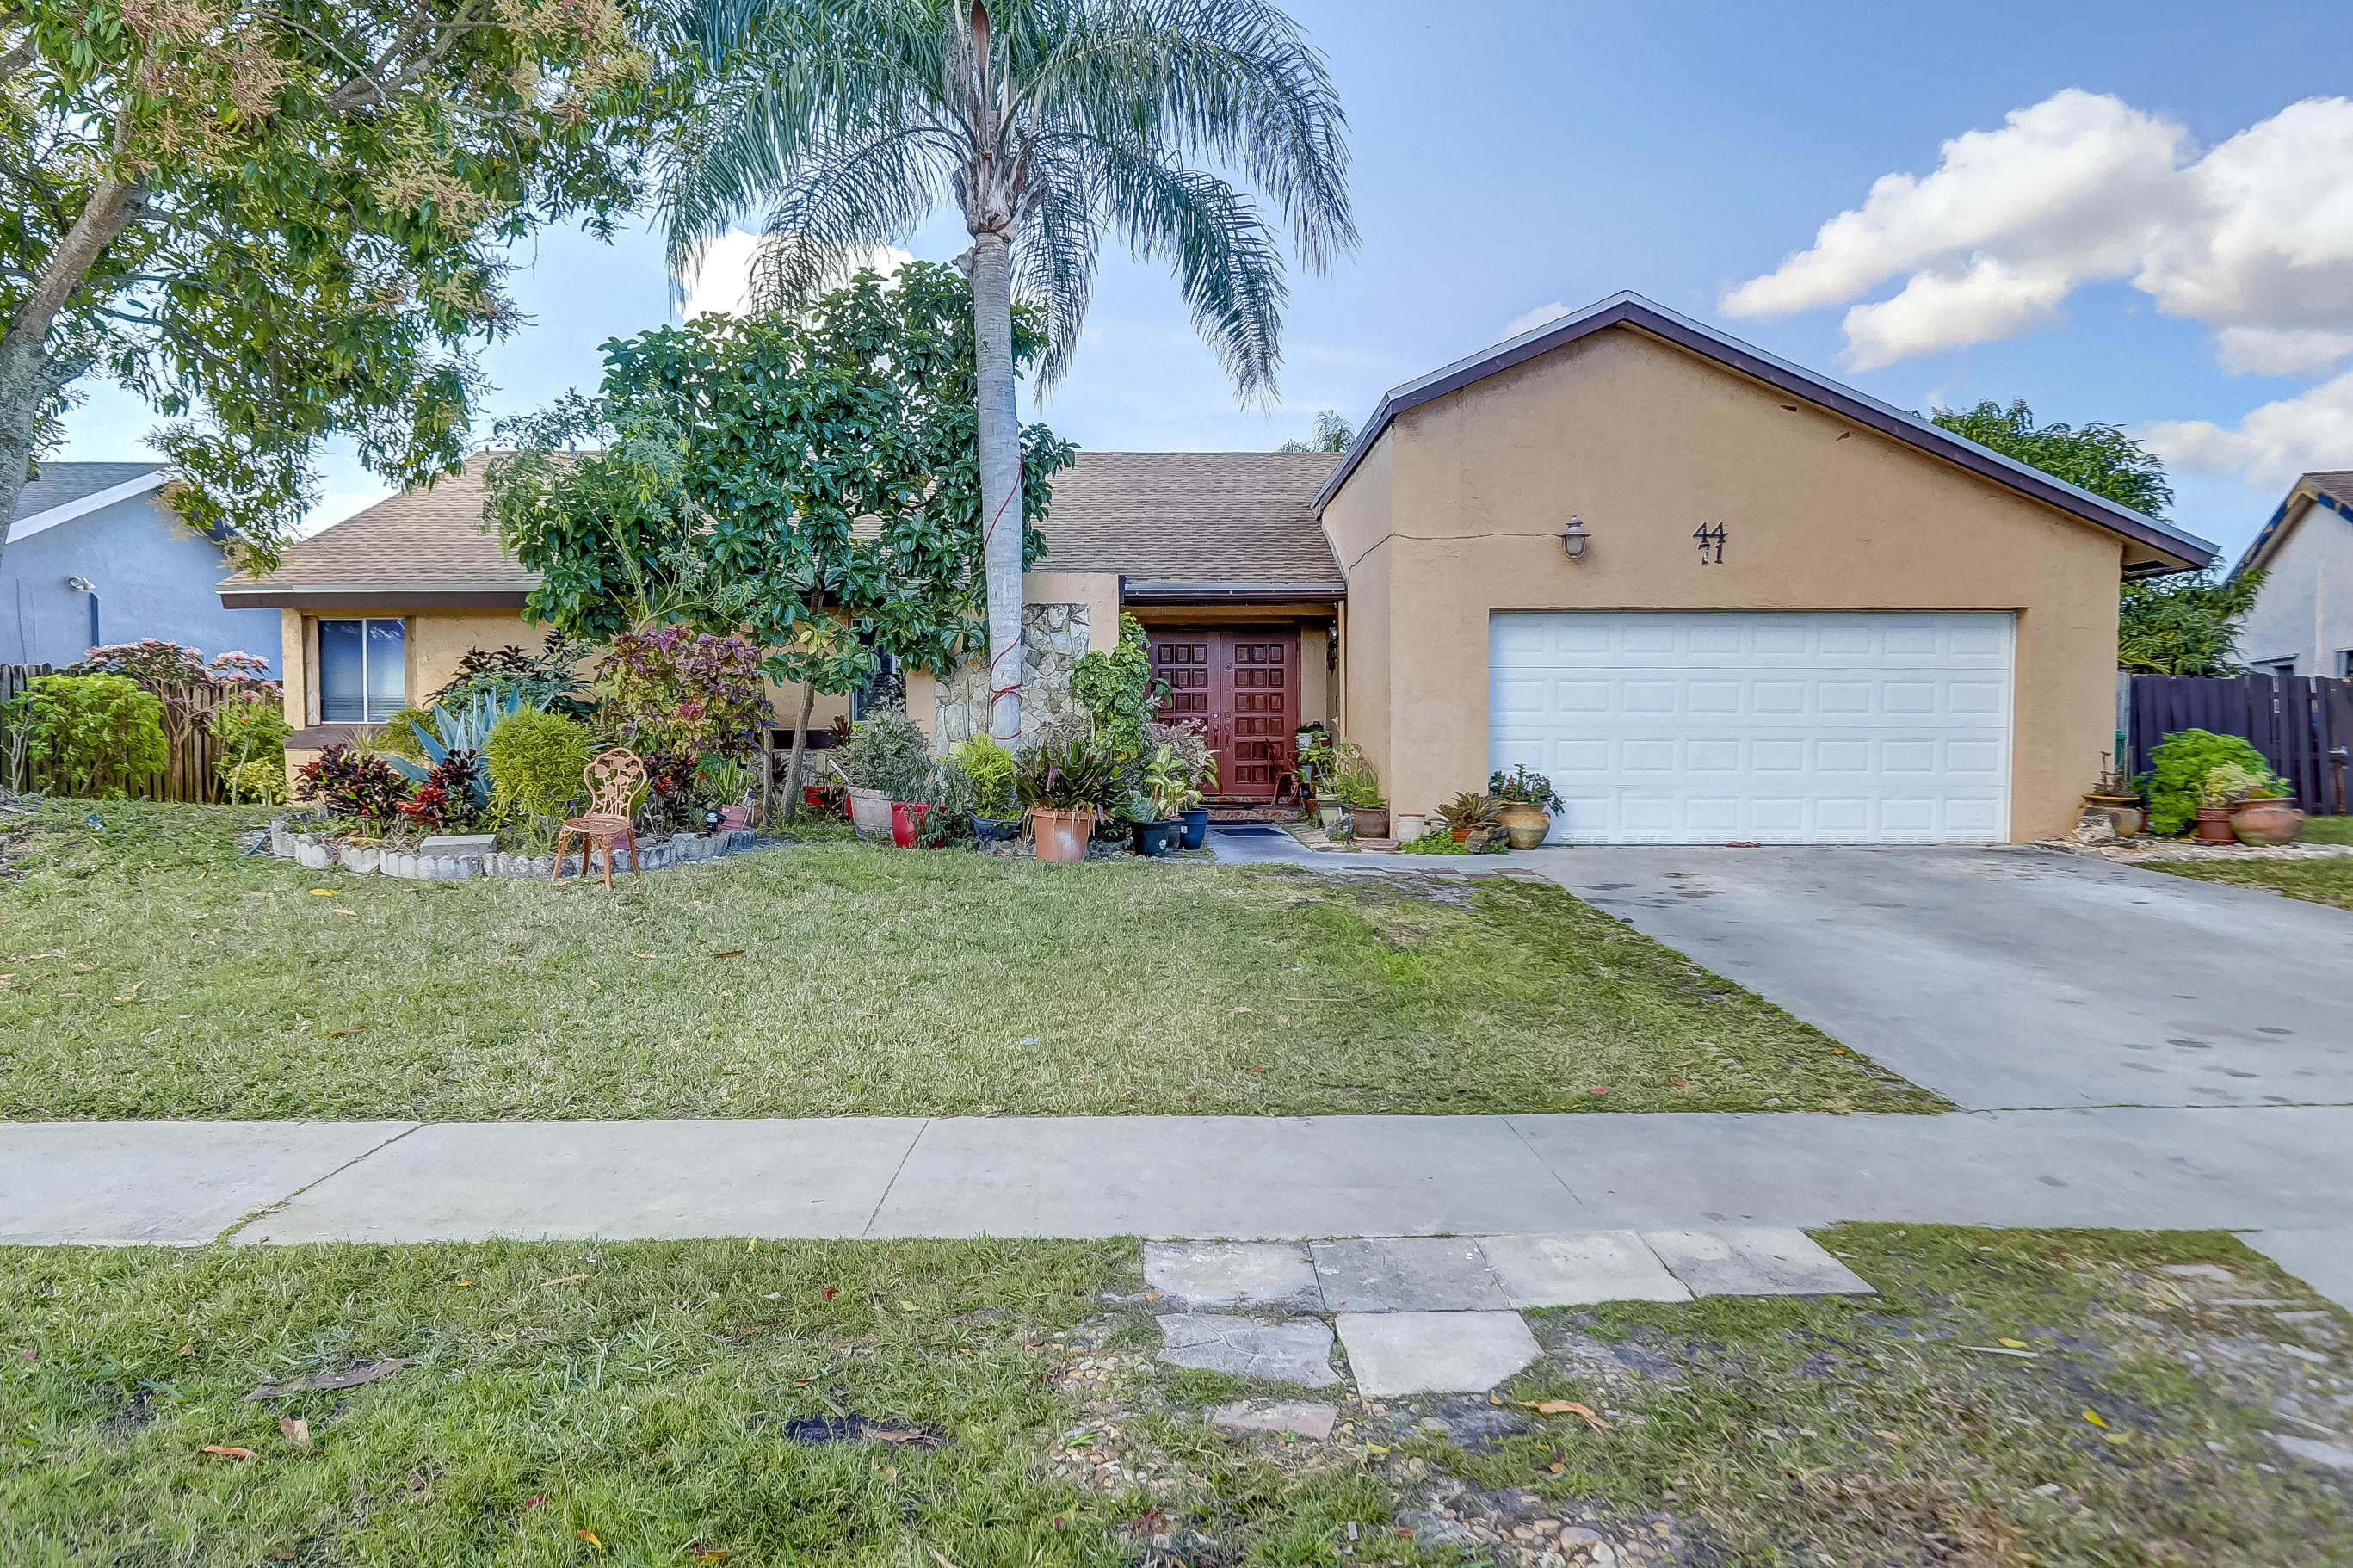 4471 72nd, Lauderhill, Florida 33319